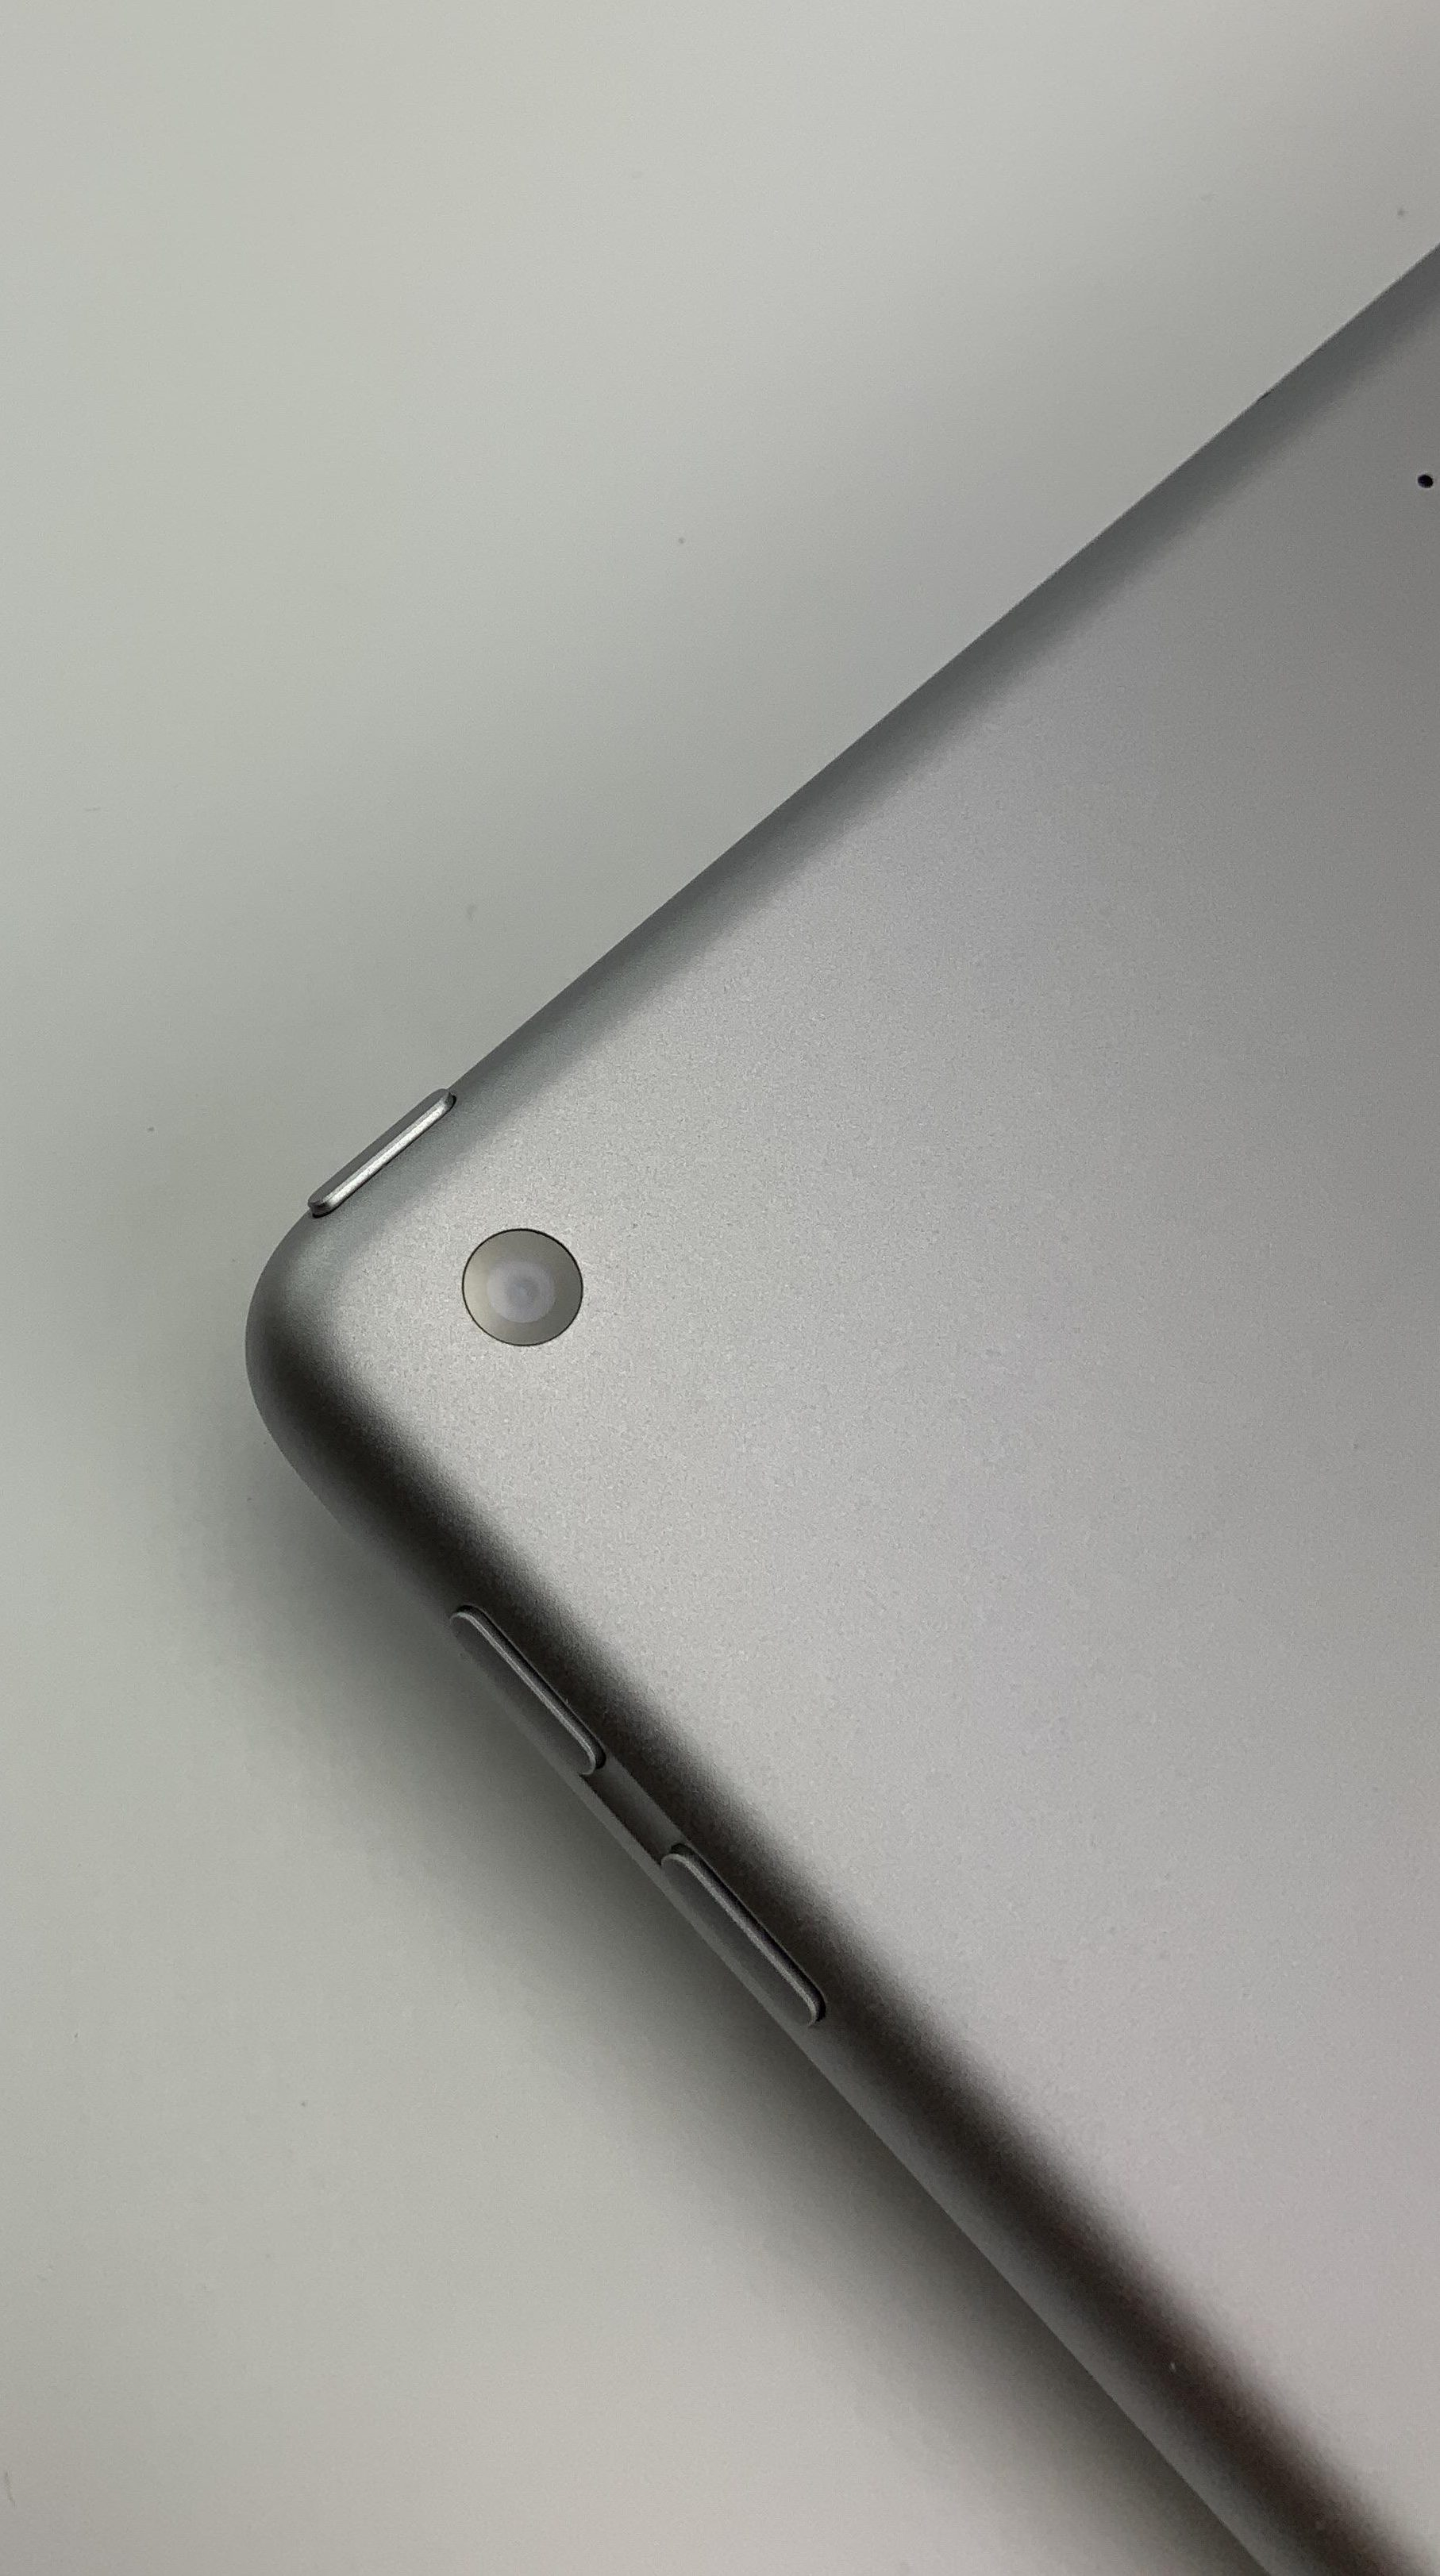 iPad 6 Wi-Fi 128GB, 128GB, Space Gray, Kuva 3